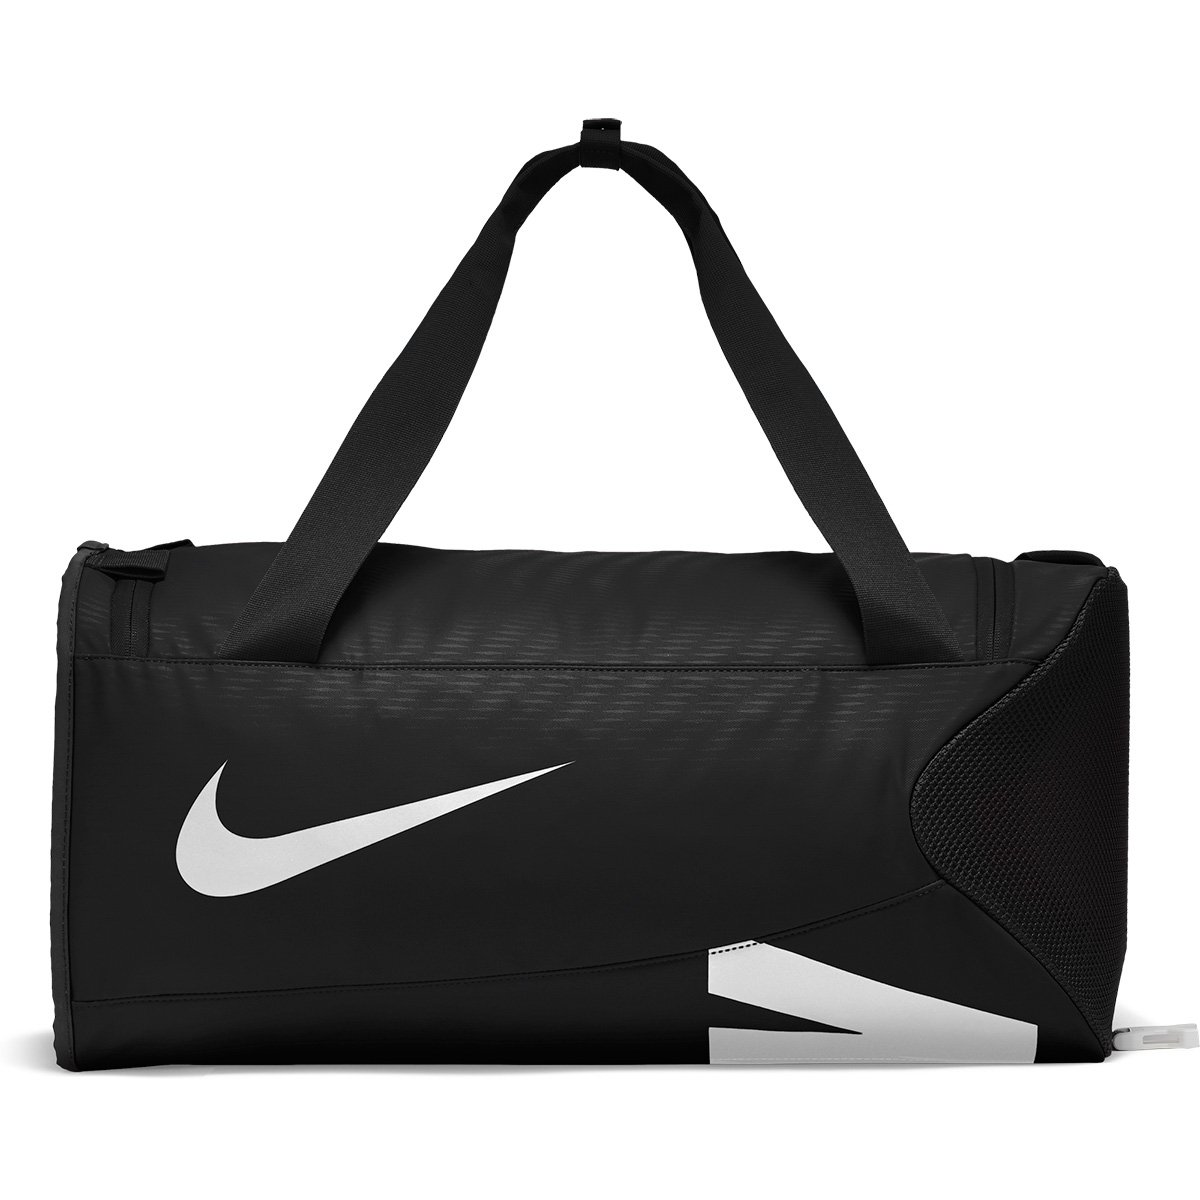 Mala Nike Alpha Adapt Crossbody Duffel Masculina - Compre Agora ... 8014c4465a13b